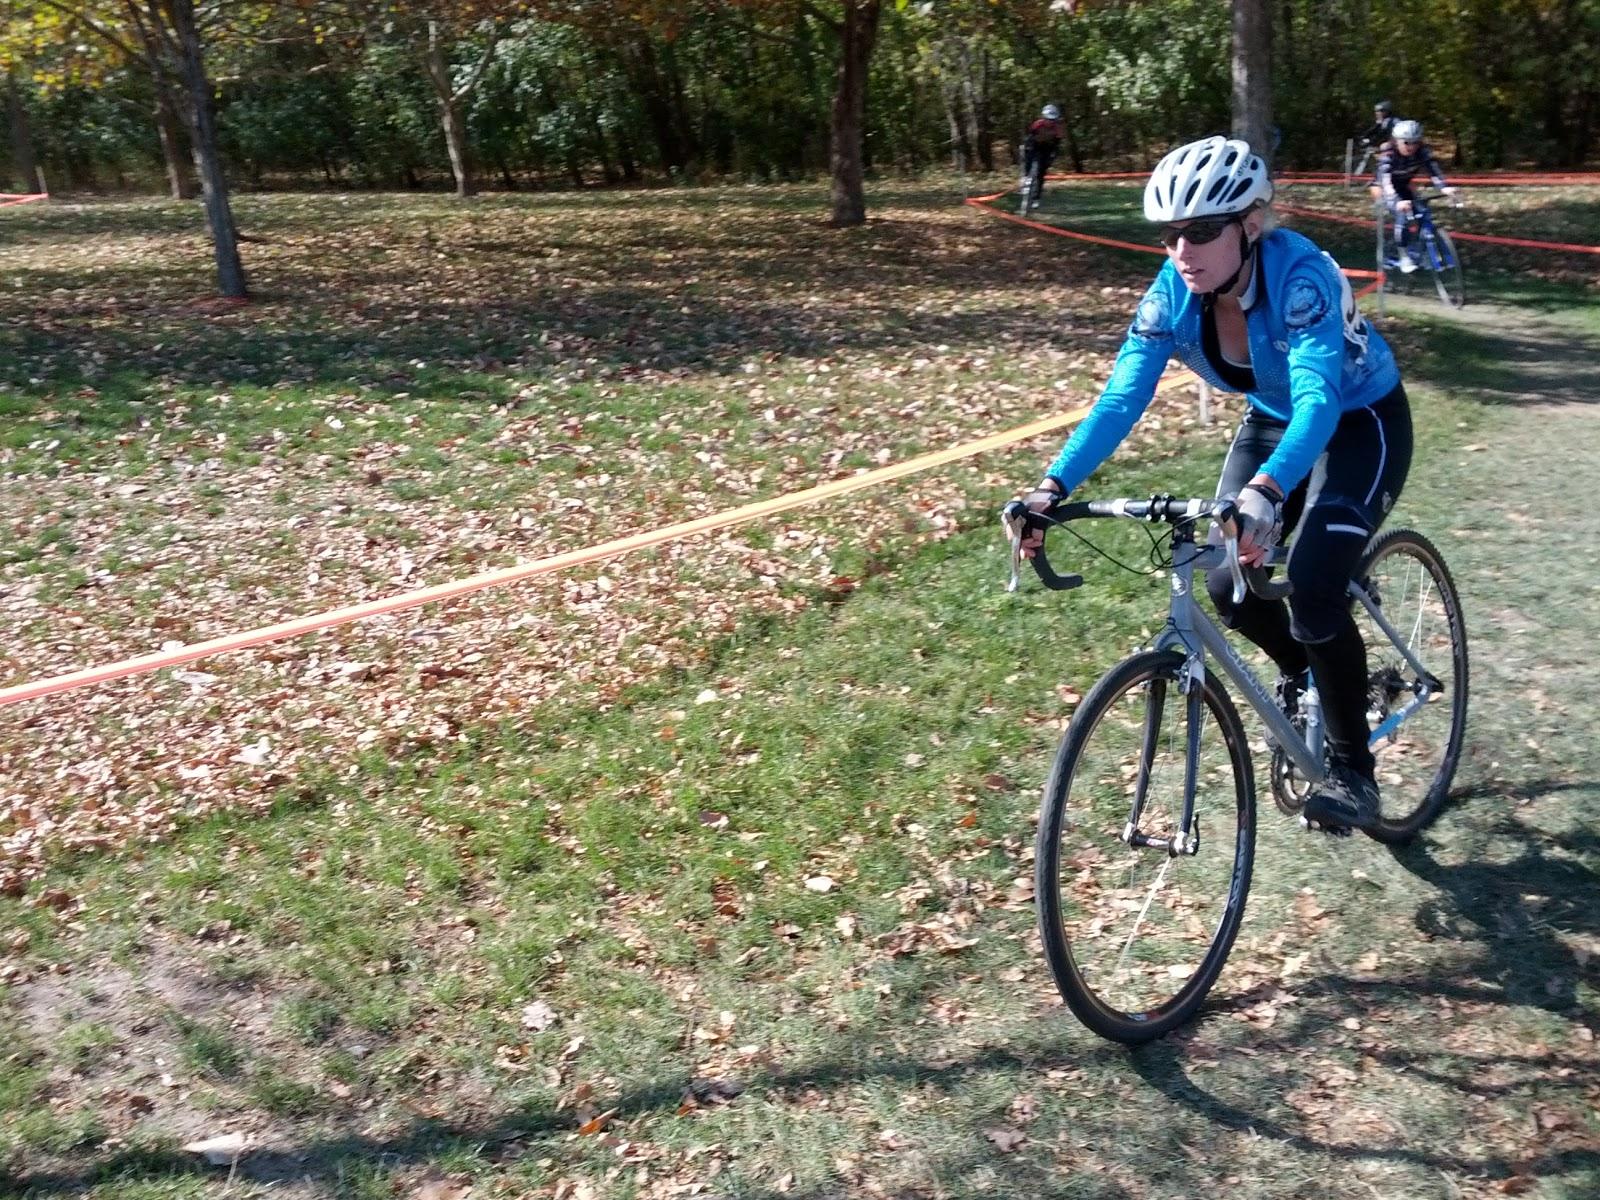 513fda950 Cat 4 Women s winner Katherine Kelter (KU Cycling - Olathe